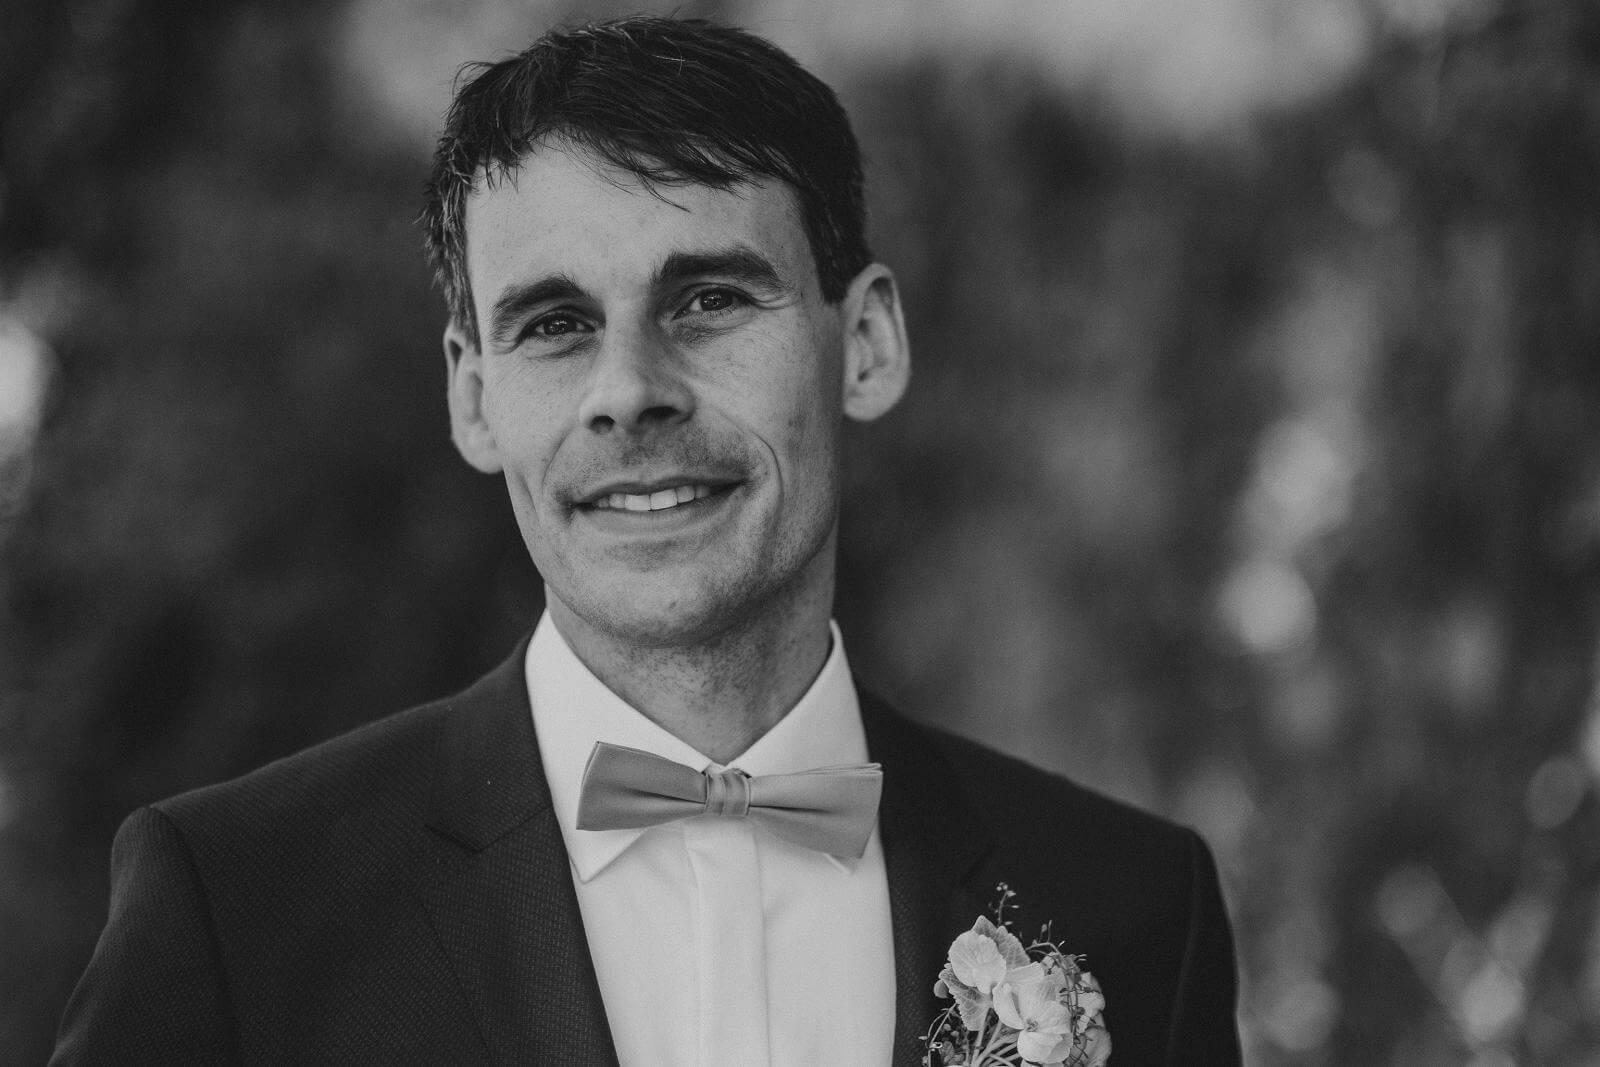 Hochzeitsfotograf Gengenbach Kinzigtal Weingut Renner (13)